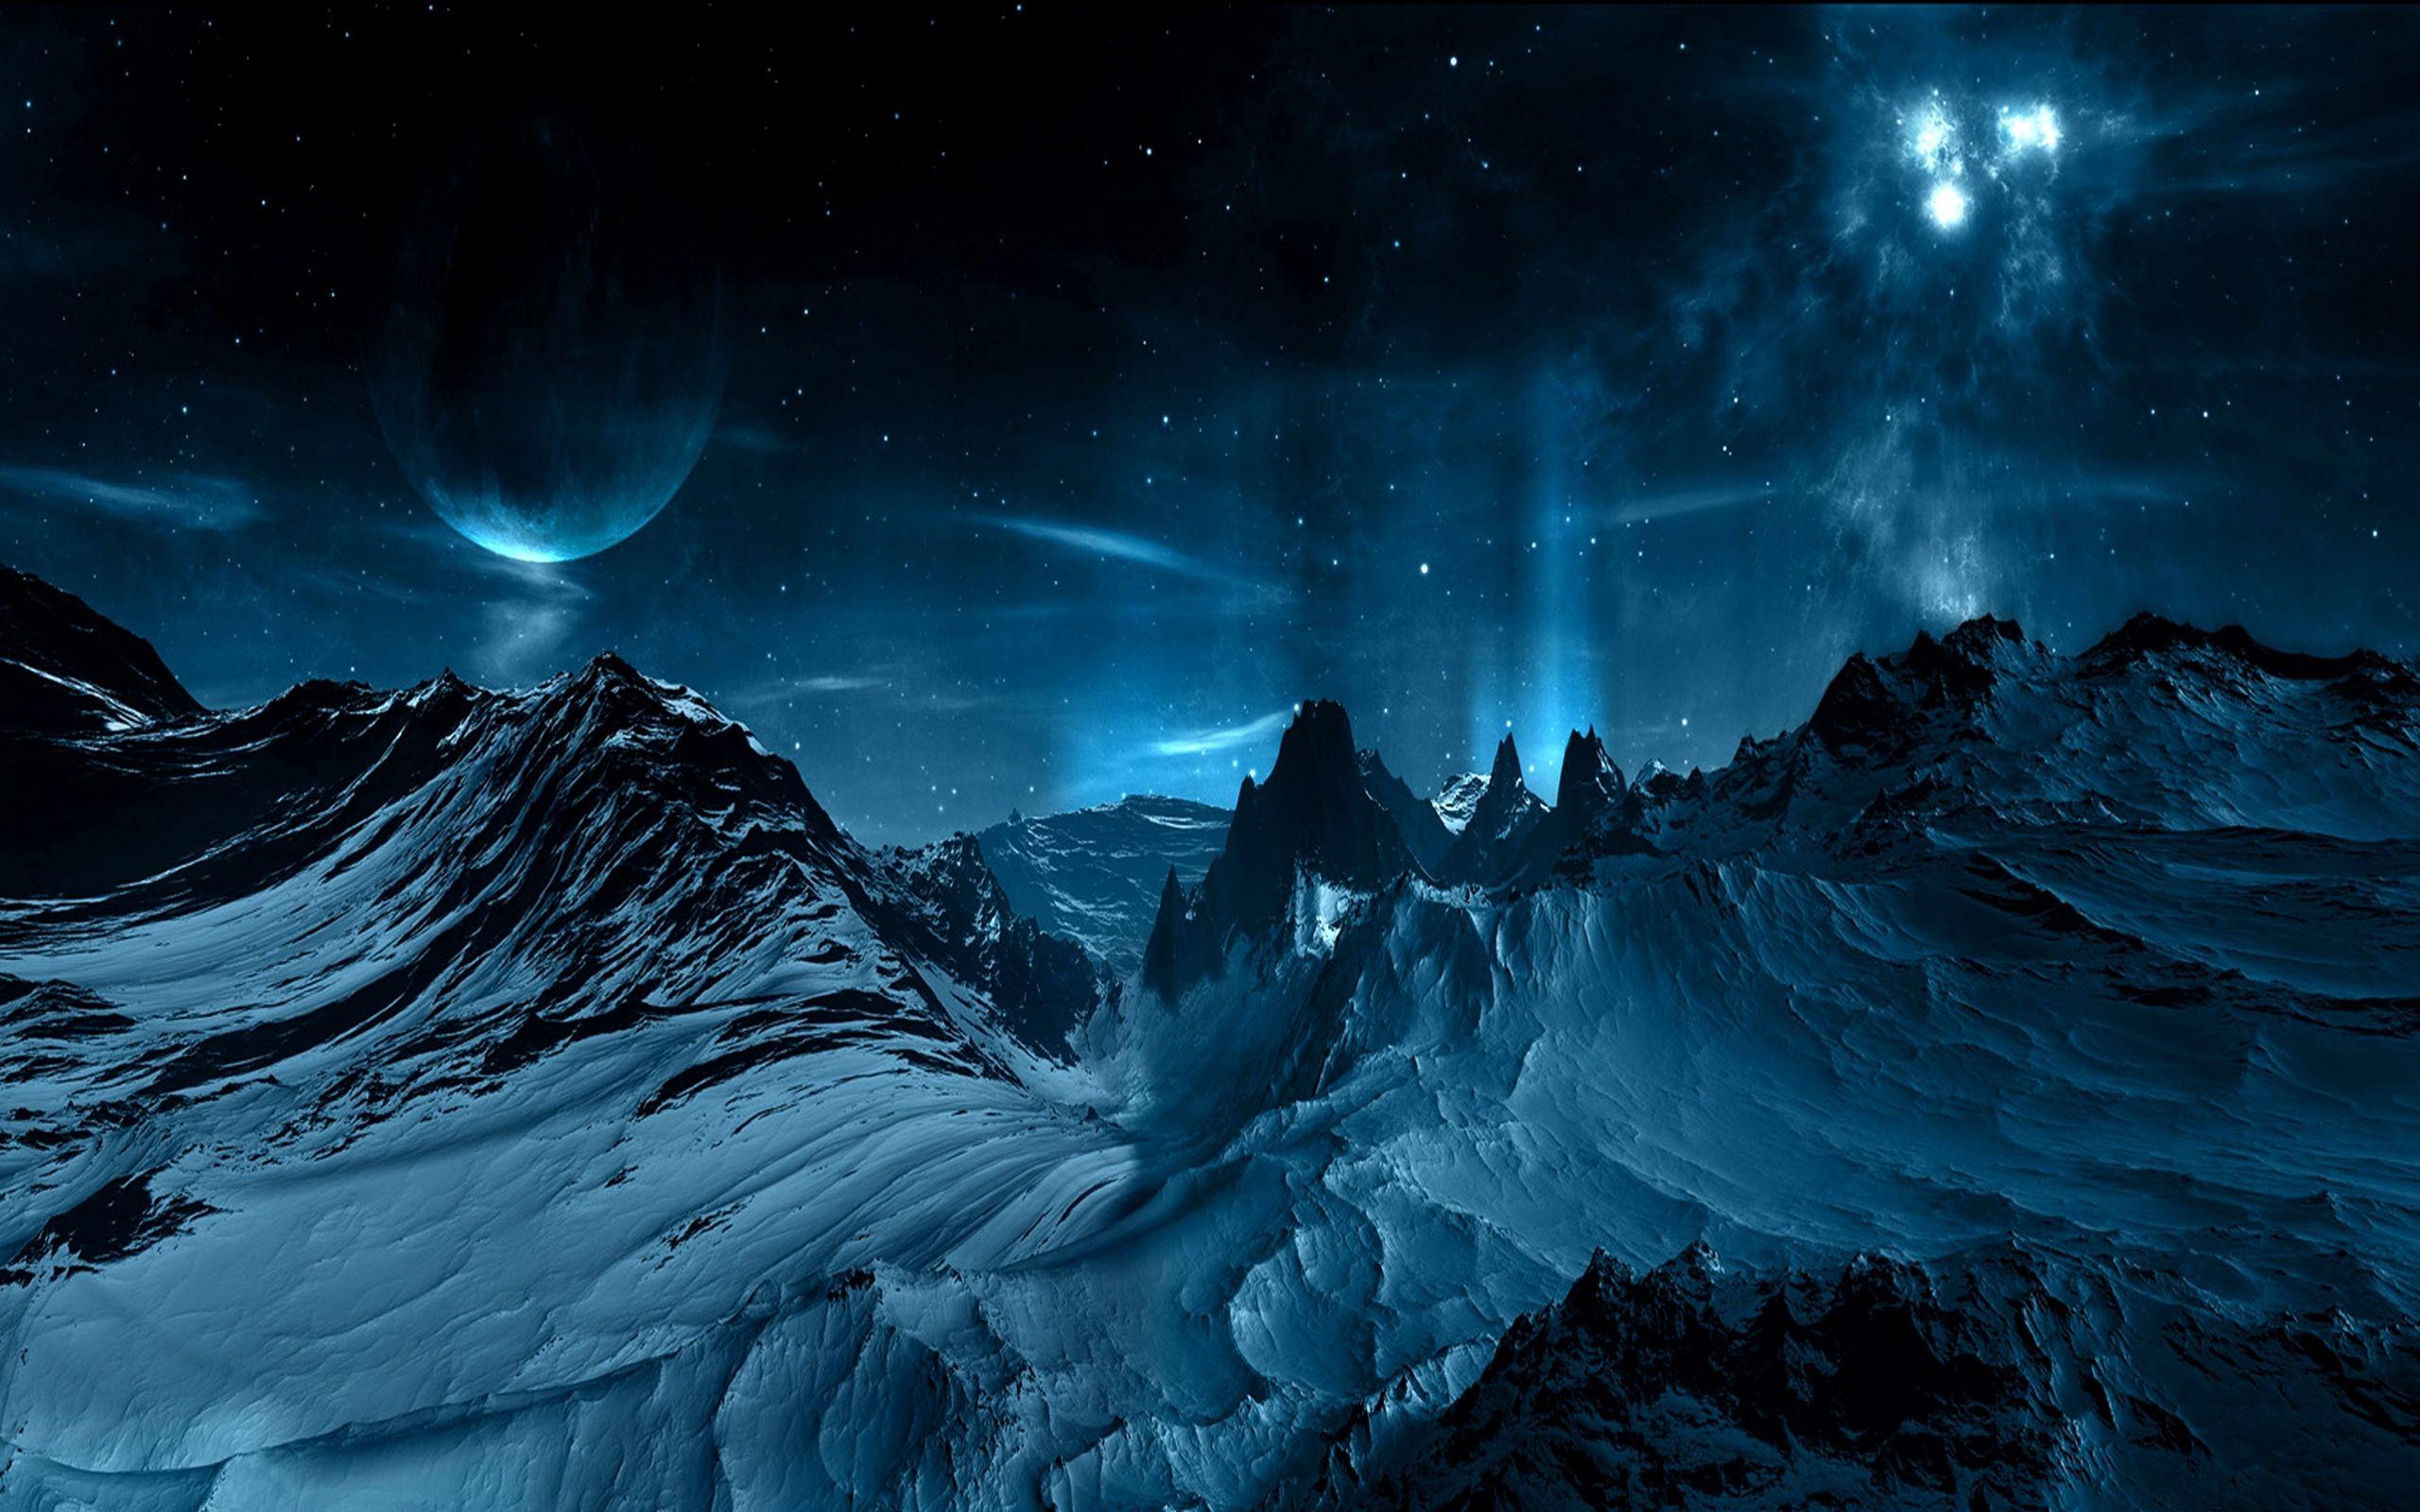 10 Top Sci Fi Hd Wallpaper Full Hd 1080p For Pc Background Night Sky Wallpaper Sci Fi Wallpaper Landscape Wallpaper